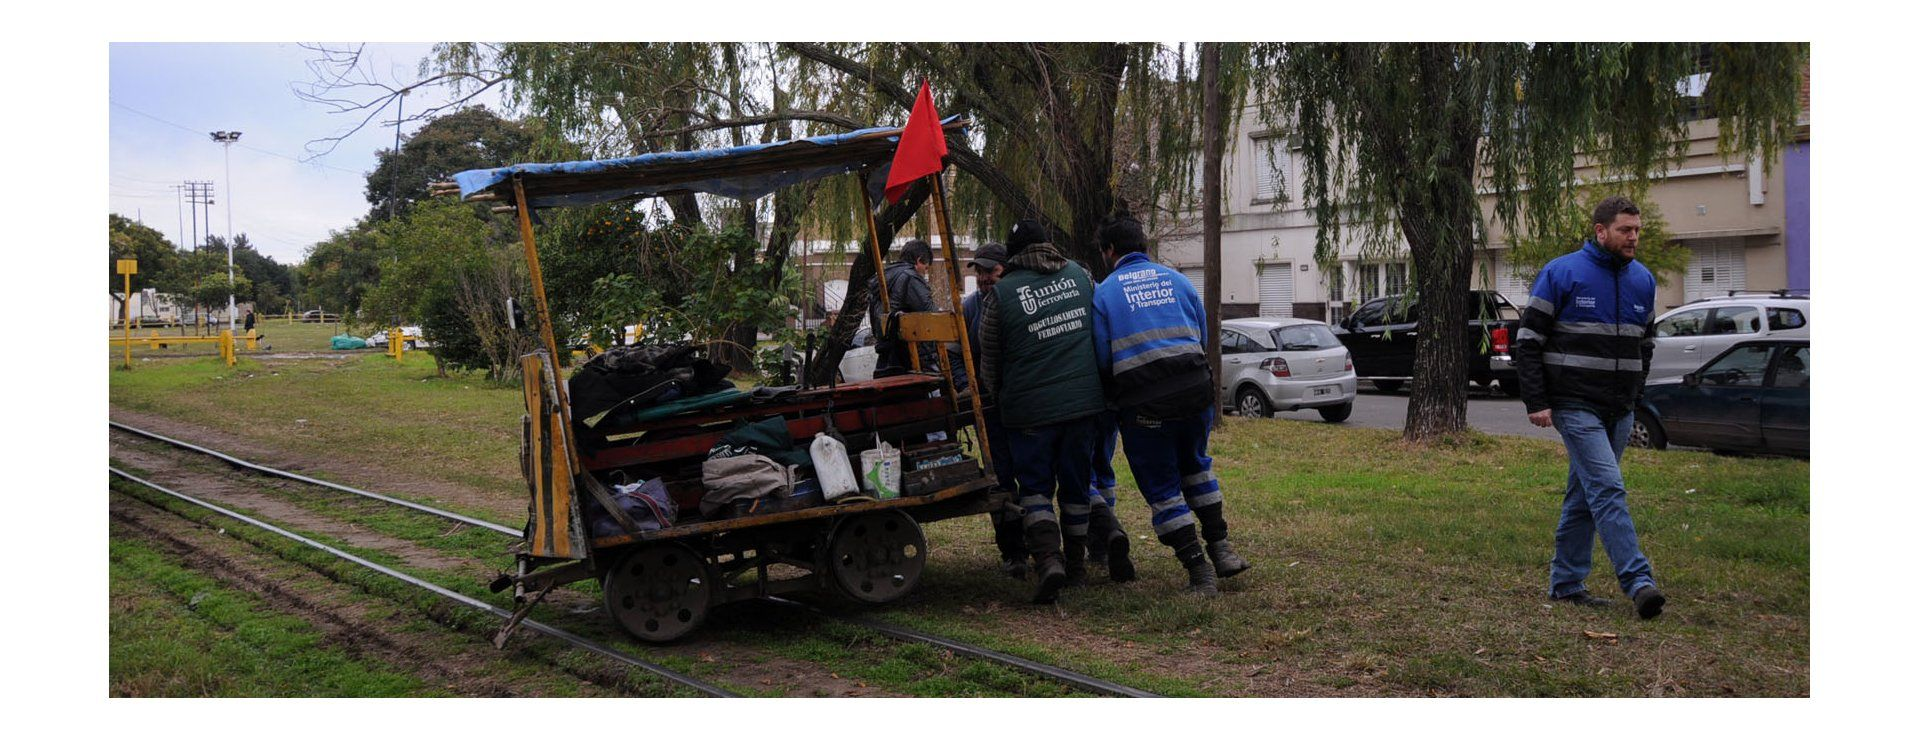 Descarriló un tren del Belgrano cargas